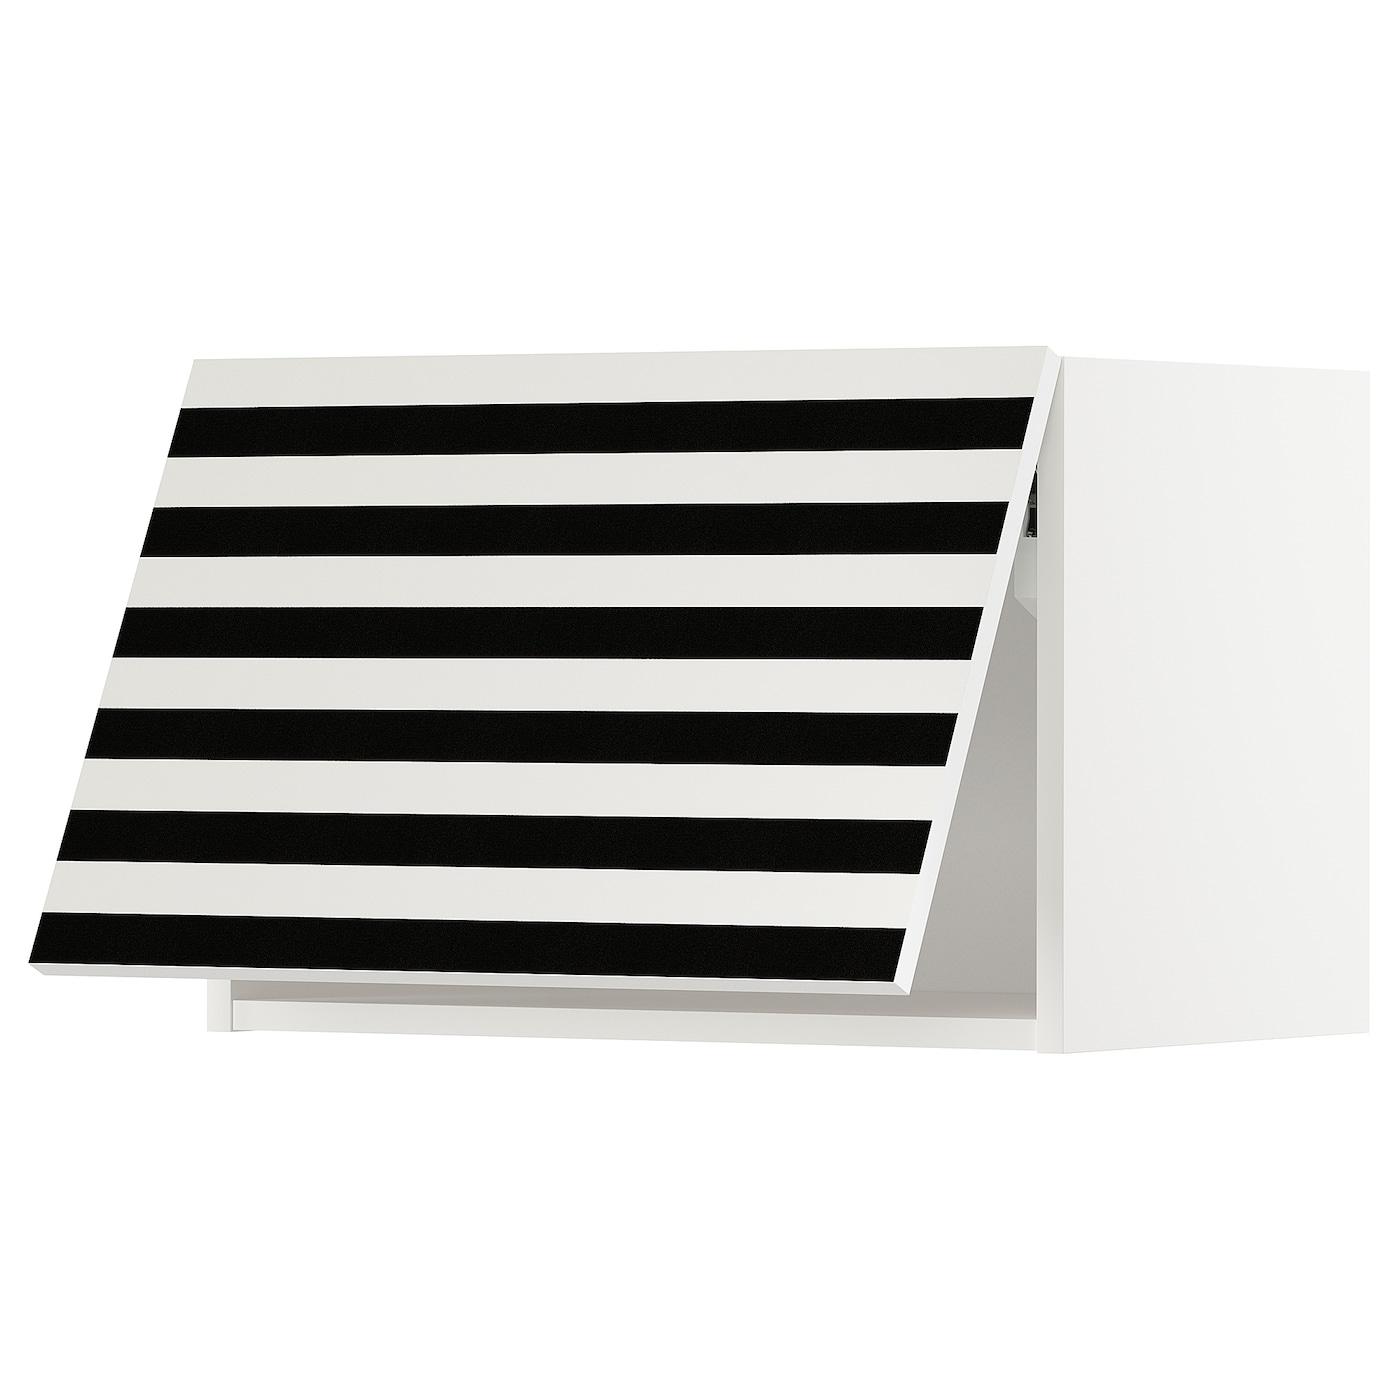 Ikea Wandschrank Horizontal.Metod Wandschrank Horizontal Weiß 092 870 69